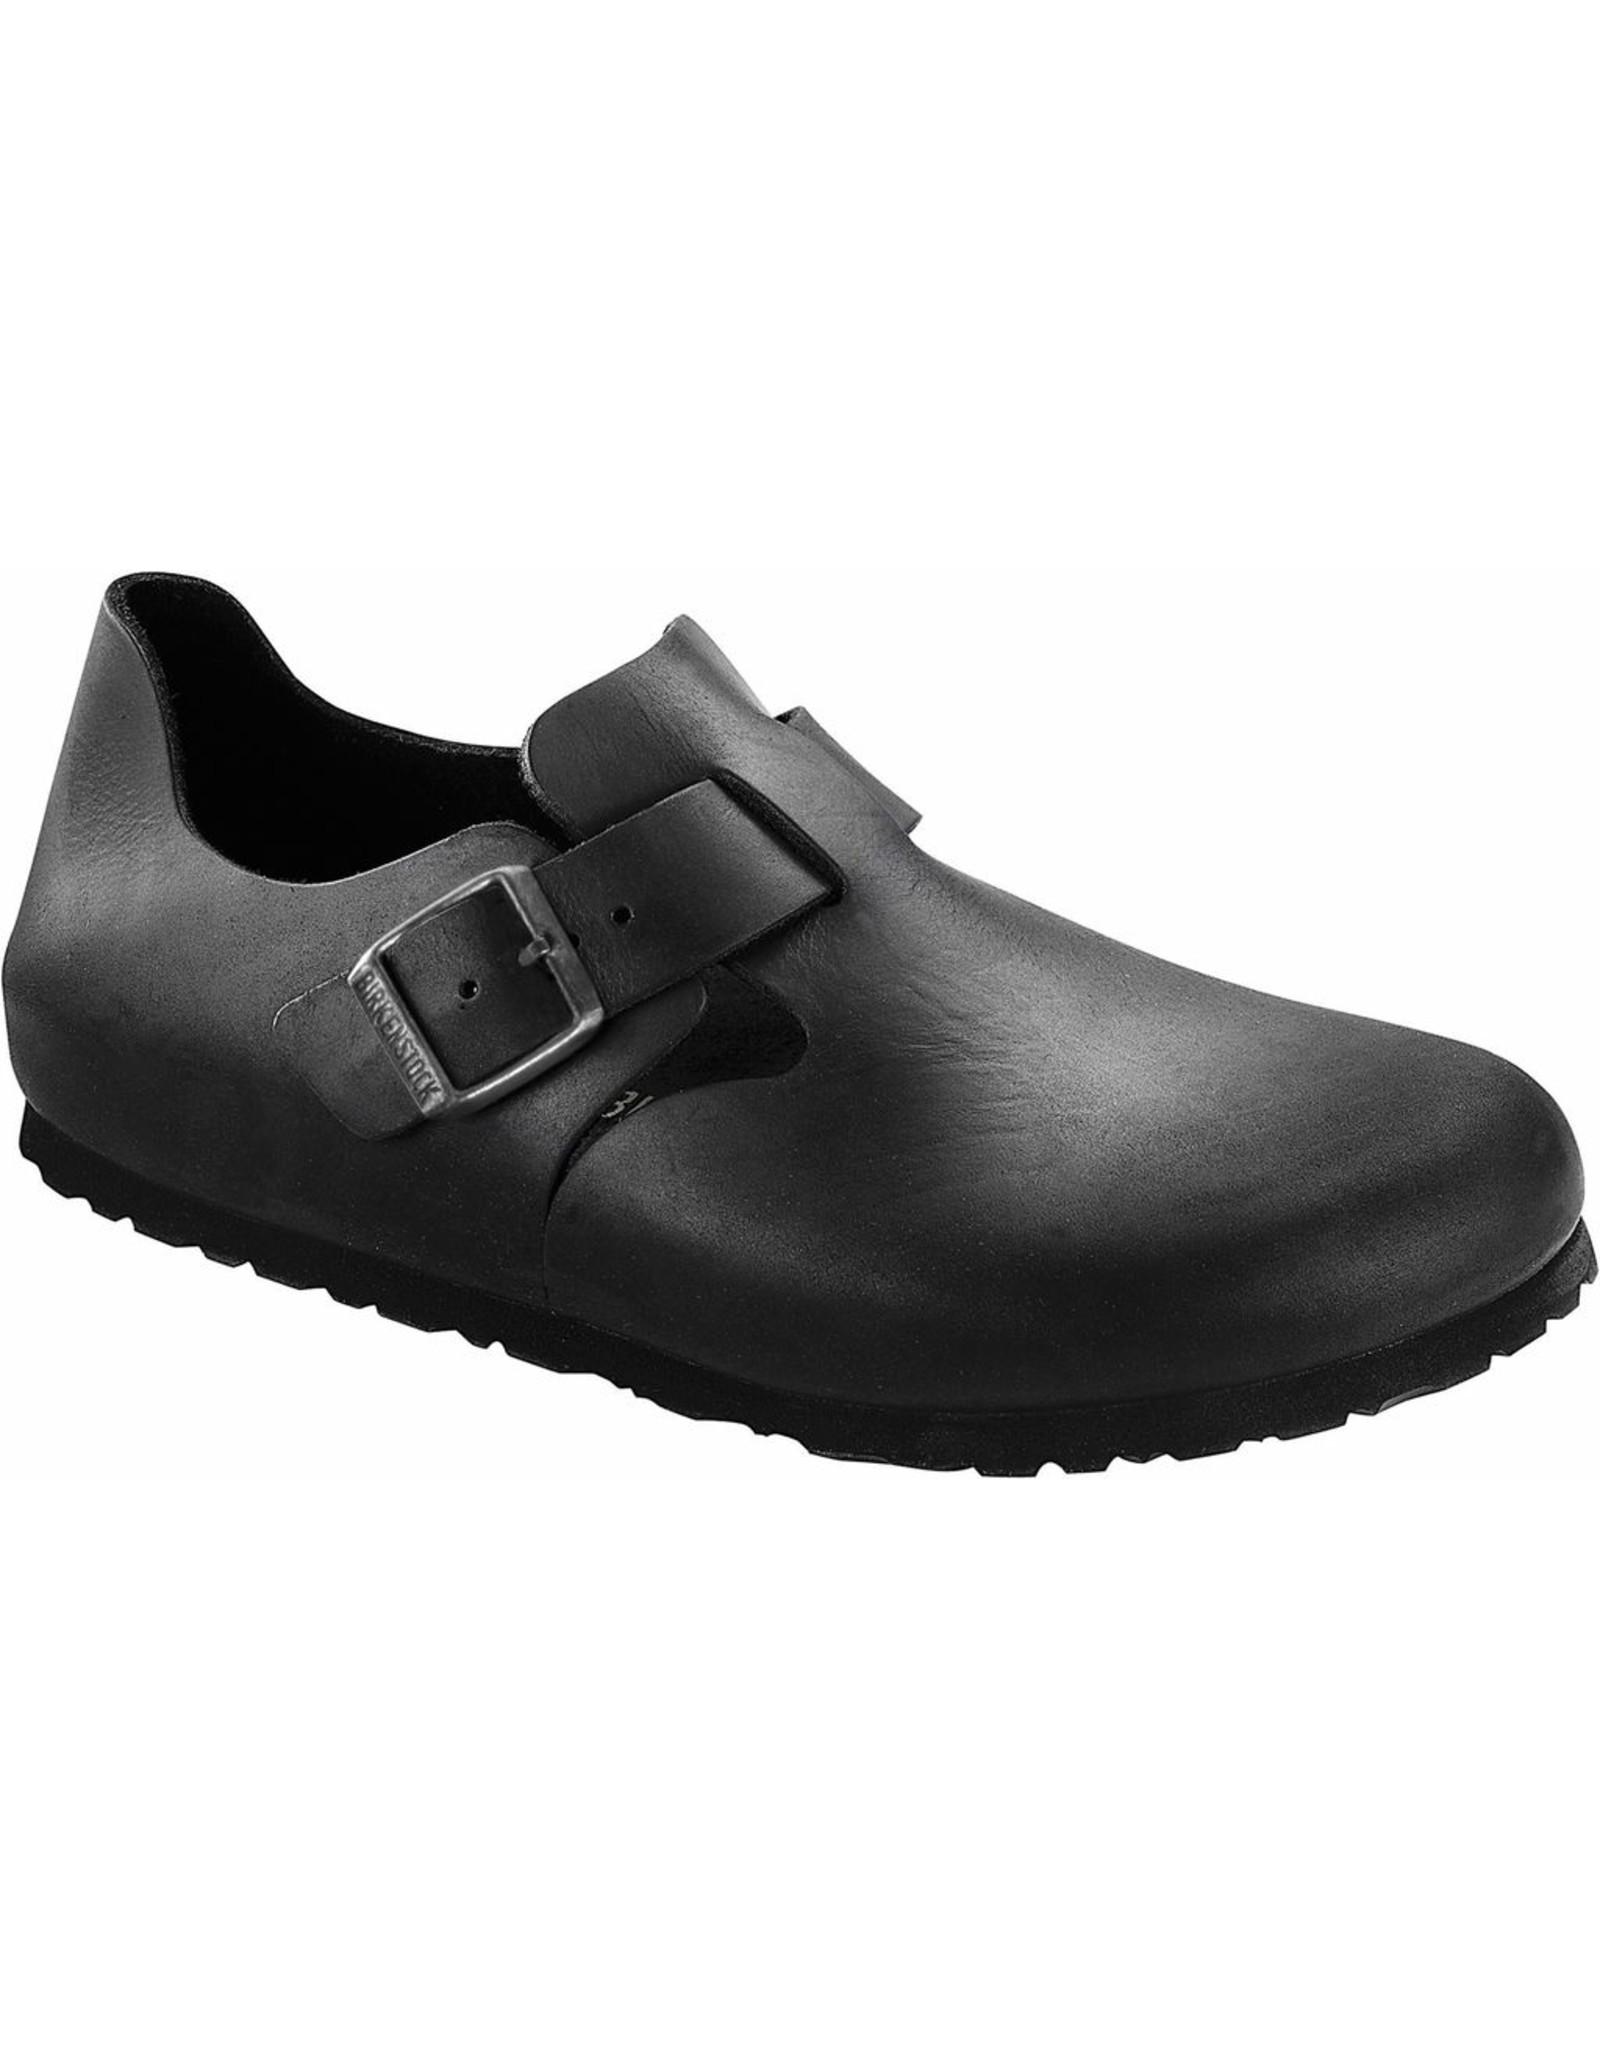 Birkenstock London Black Oiled Leather Shoe